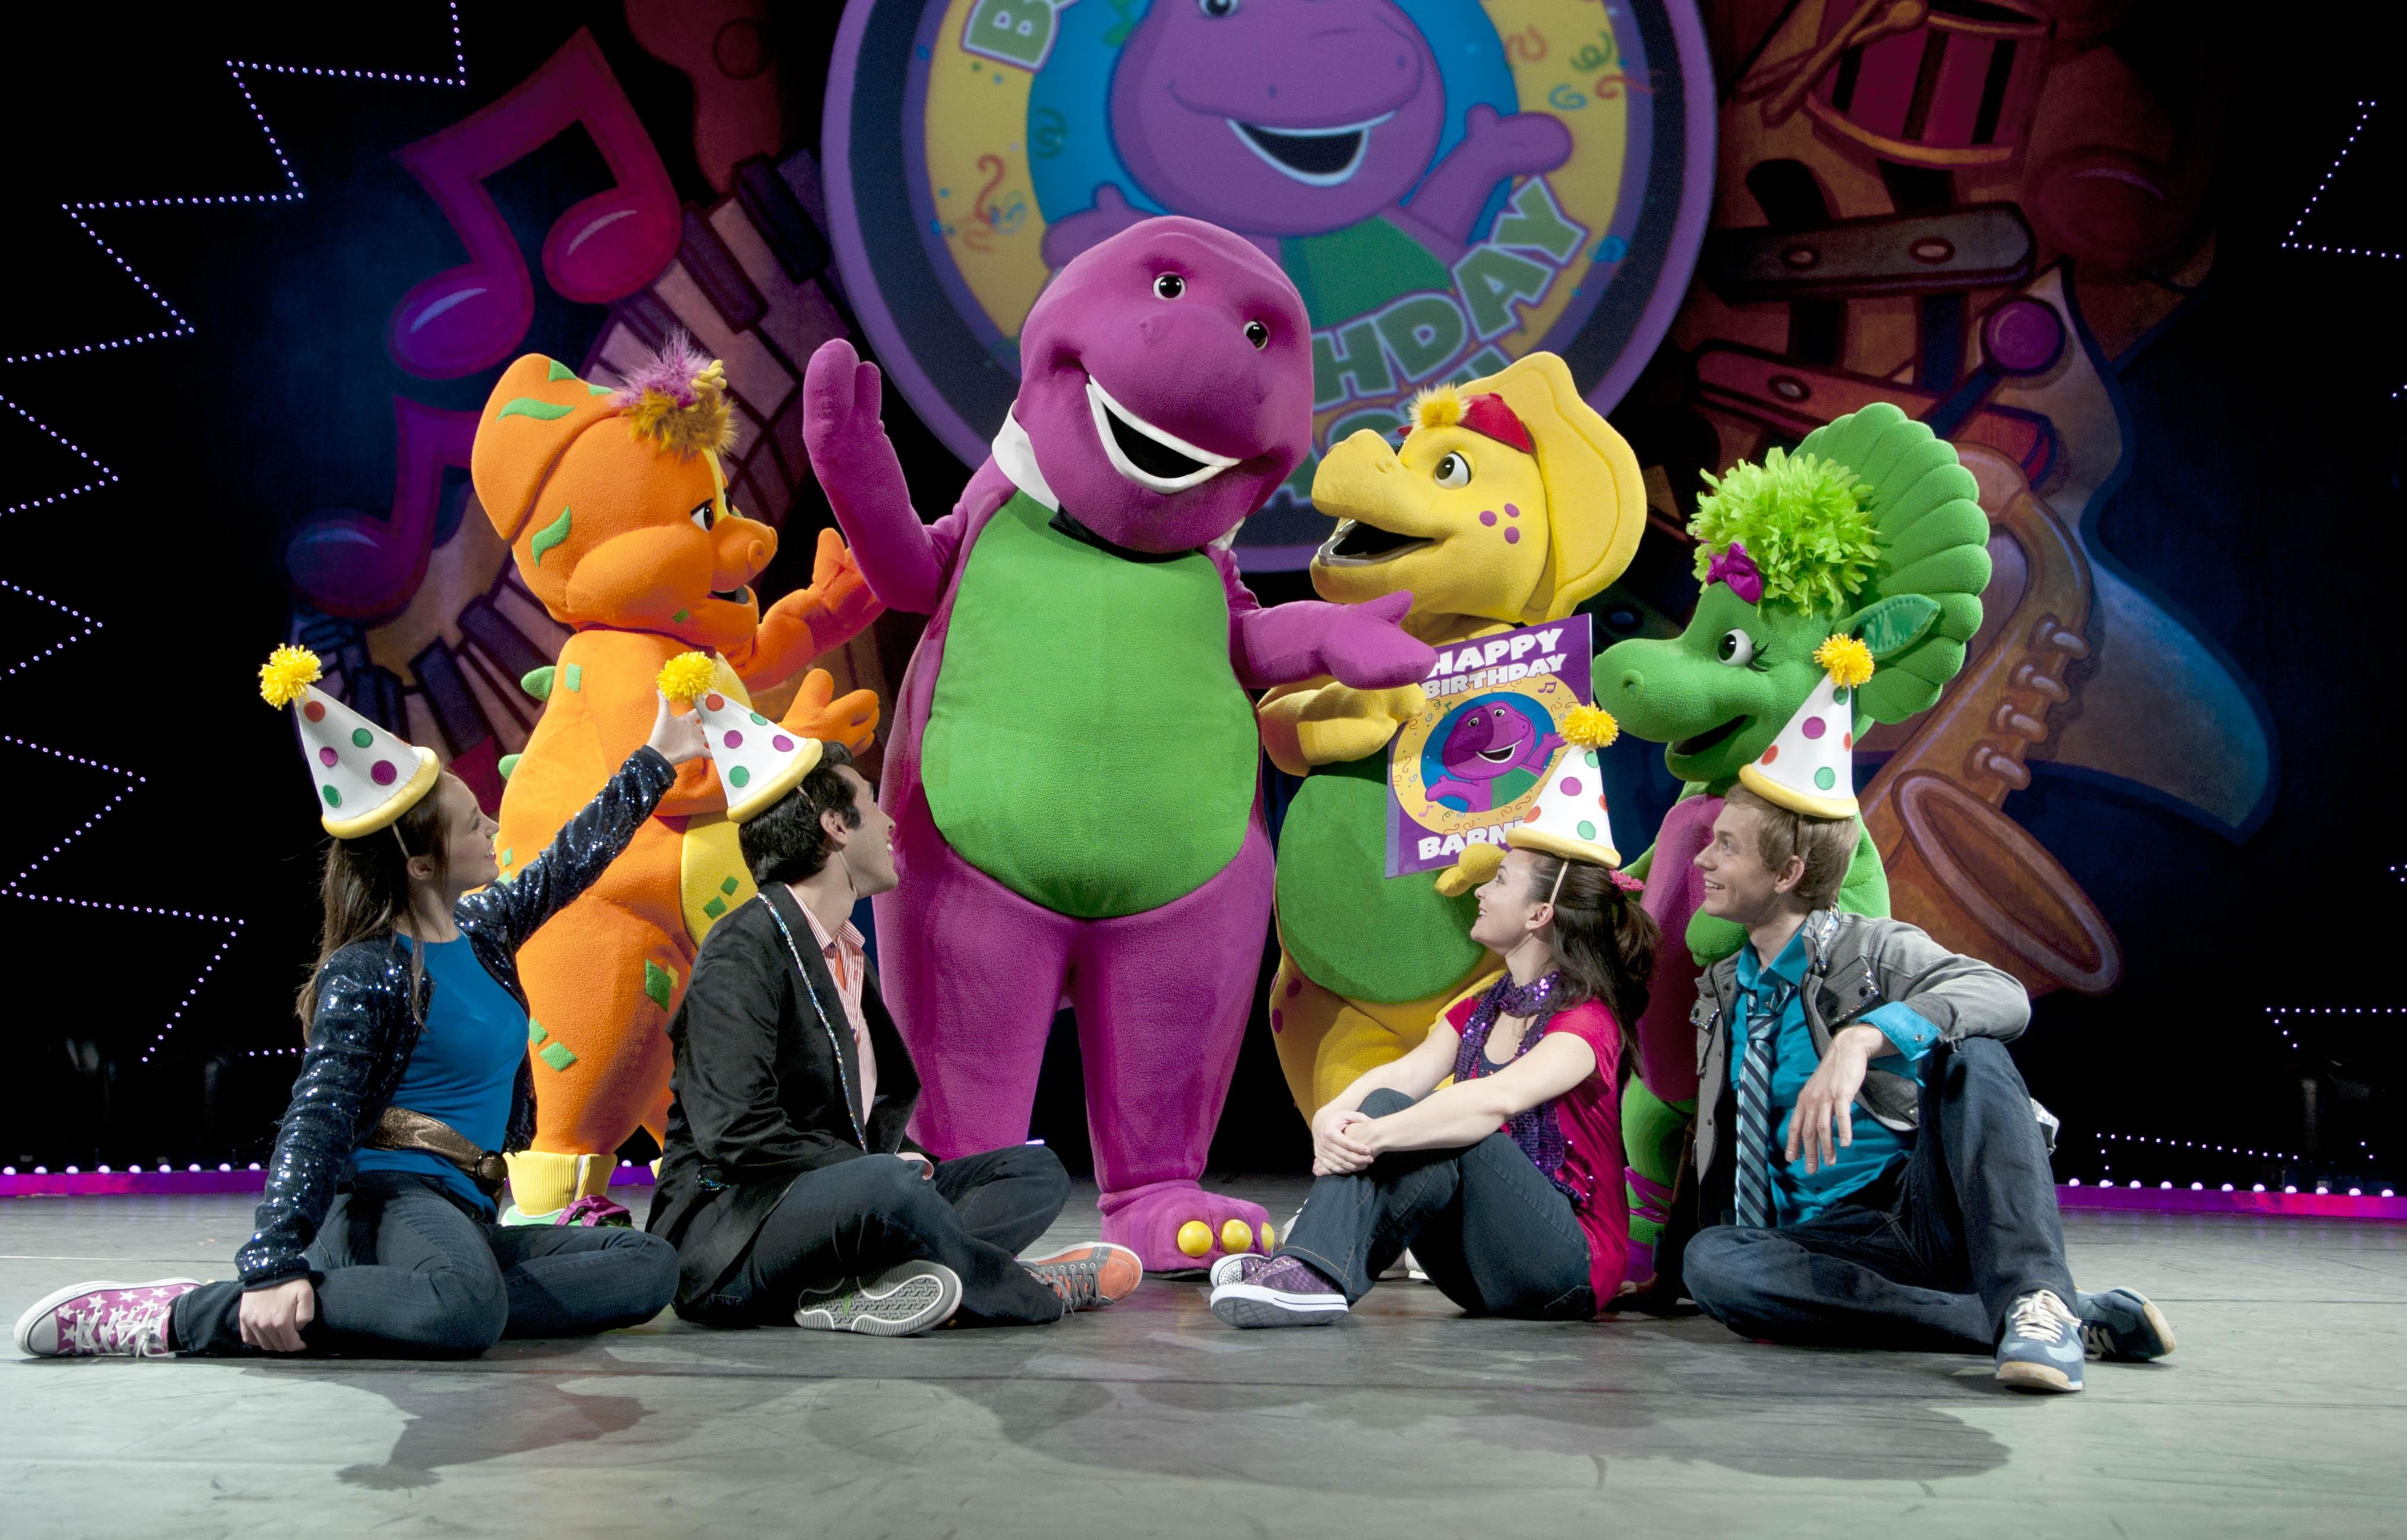 Image Barney Live Birthday Bashjpg Barney Wiki FANDOM - Concert barney wiki